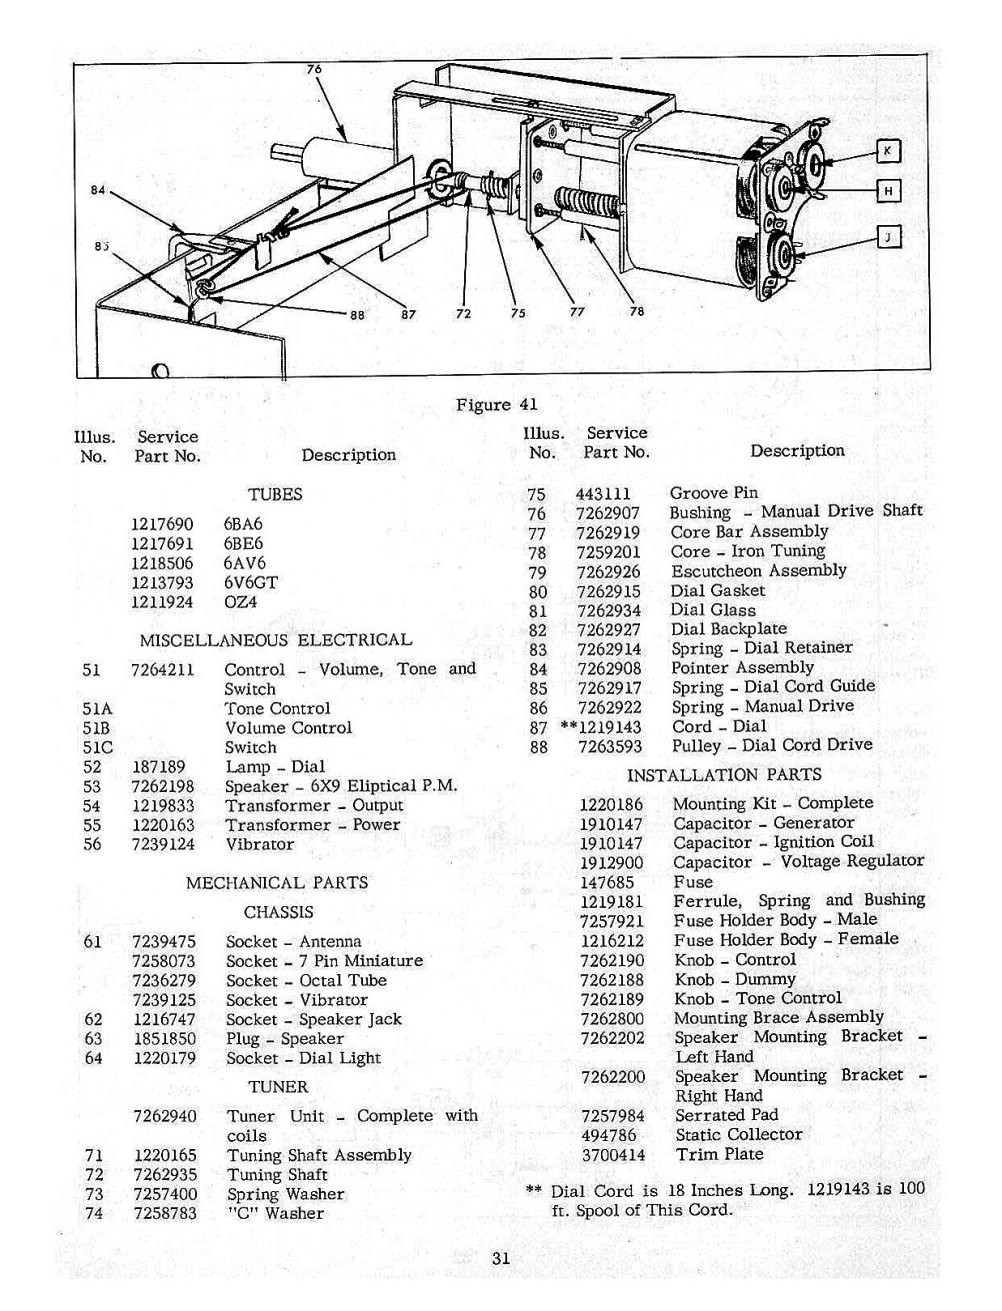 1954 Chevrolet Radio and Autronic Eye